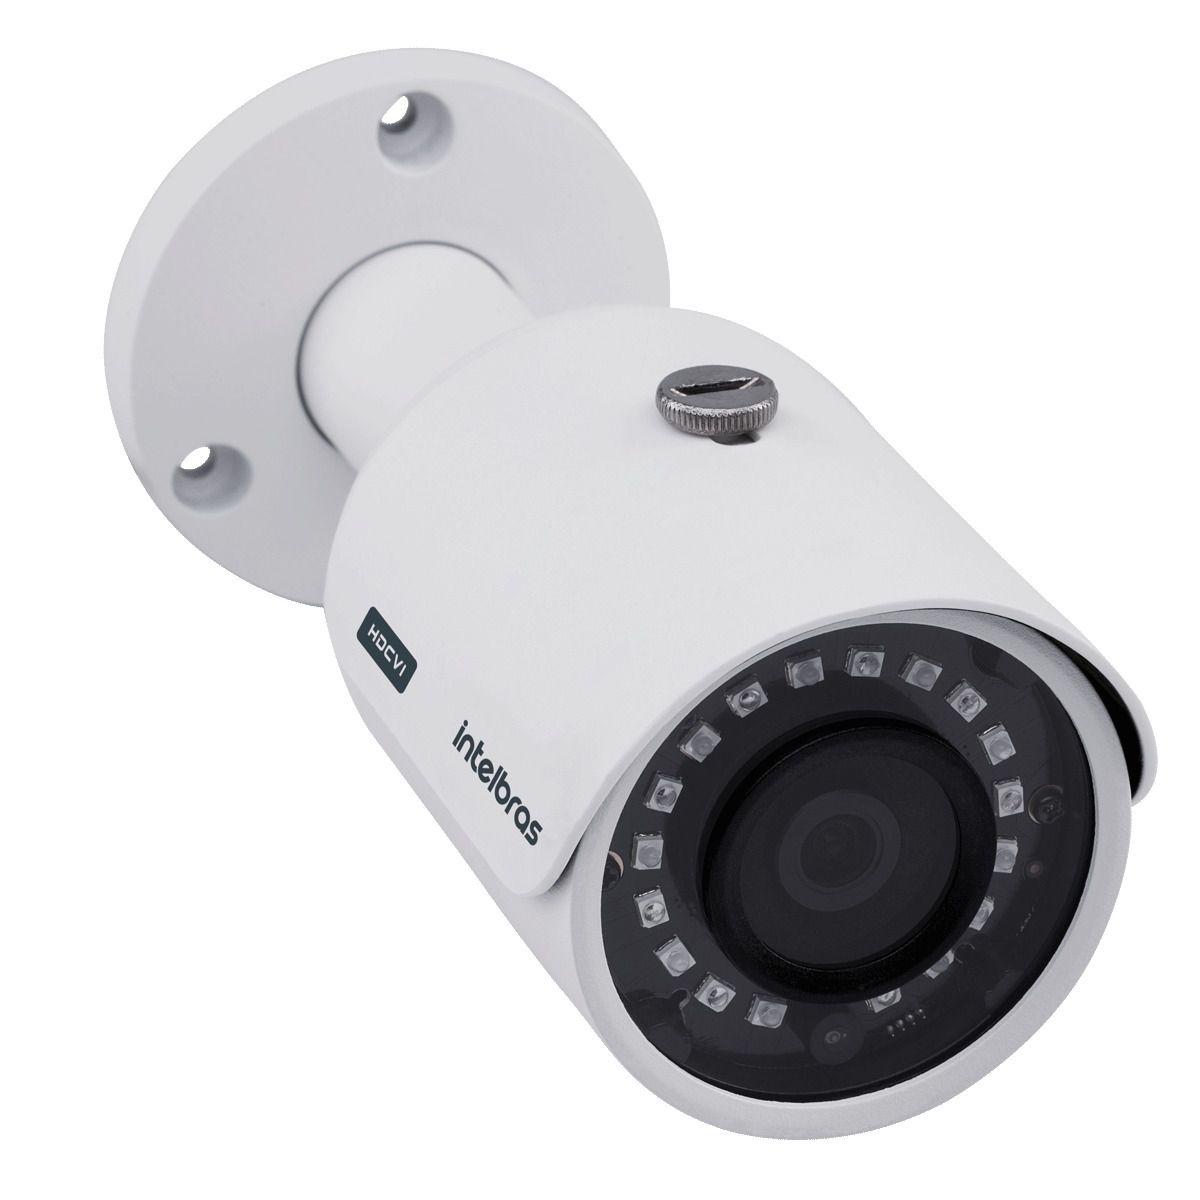 Kit 5 Câmeras Intelbras Full Hd 30m 1080p 3230b G4 Mhdx 3108